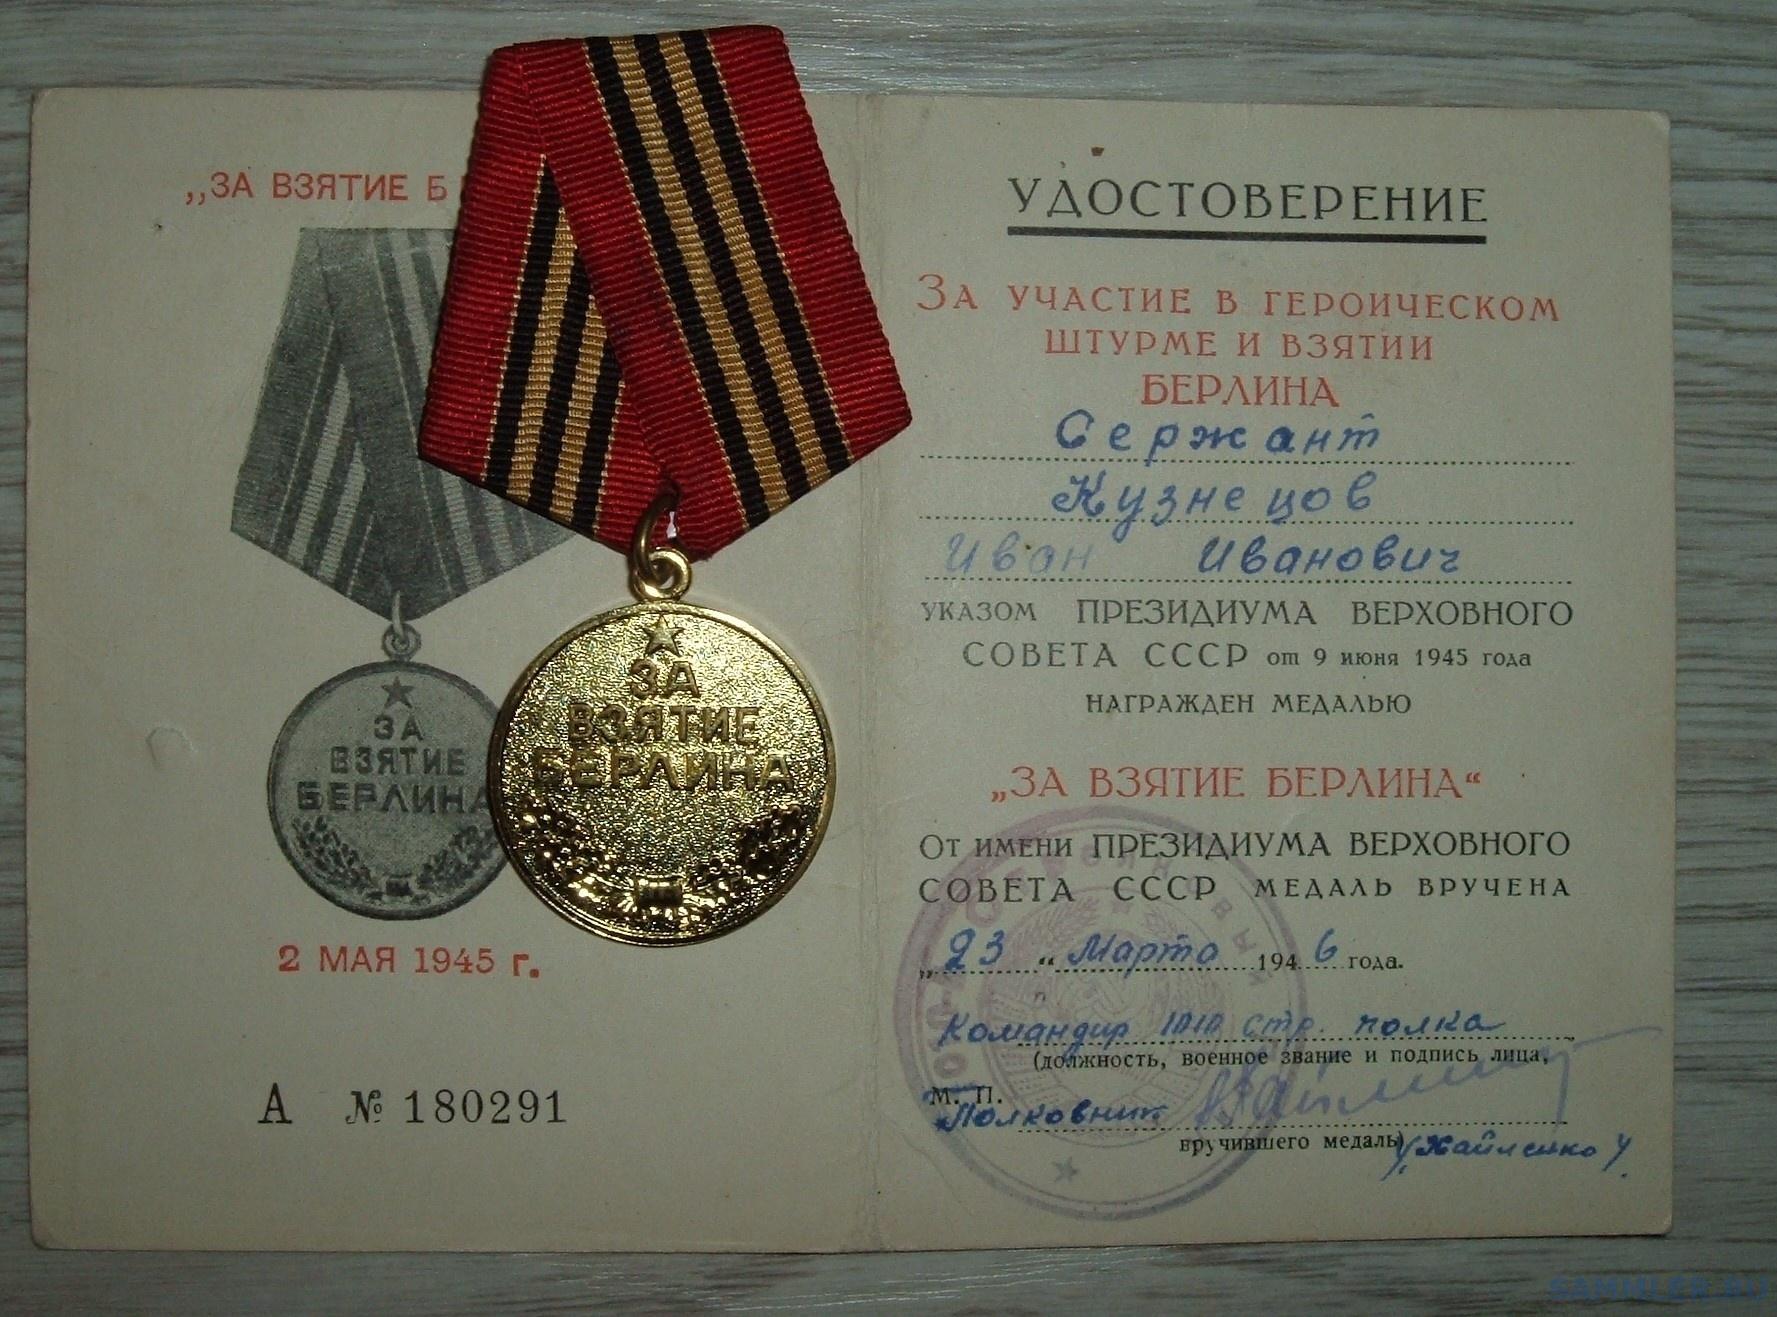 За Взятие Берлина, -Военкомат- Кузнецов Иван Иванович (1).JPG